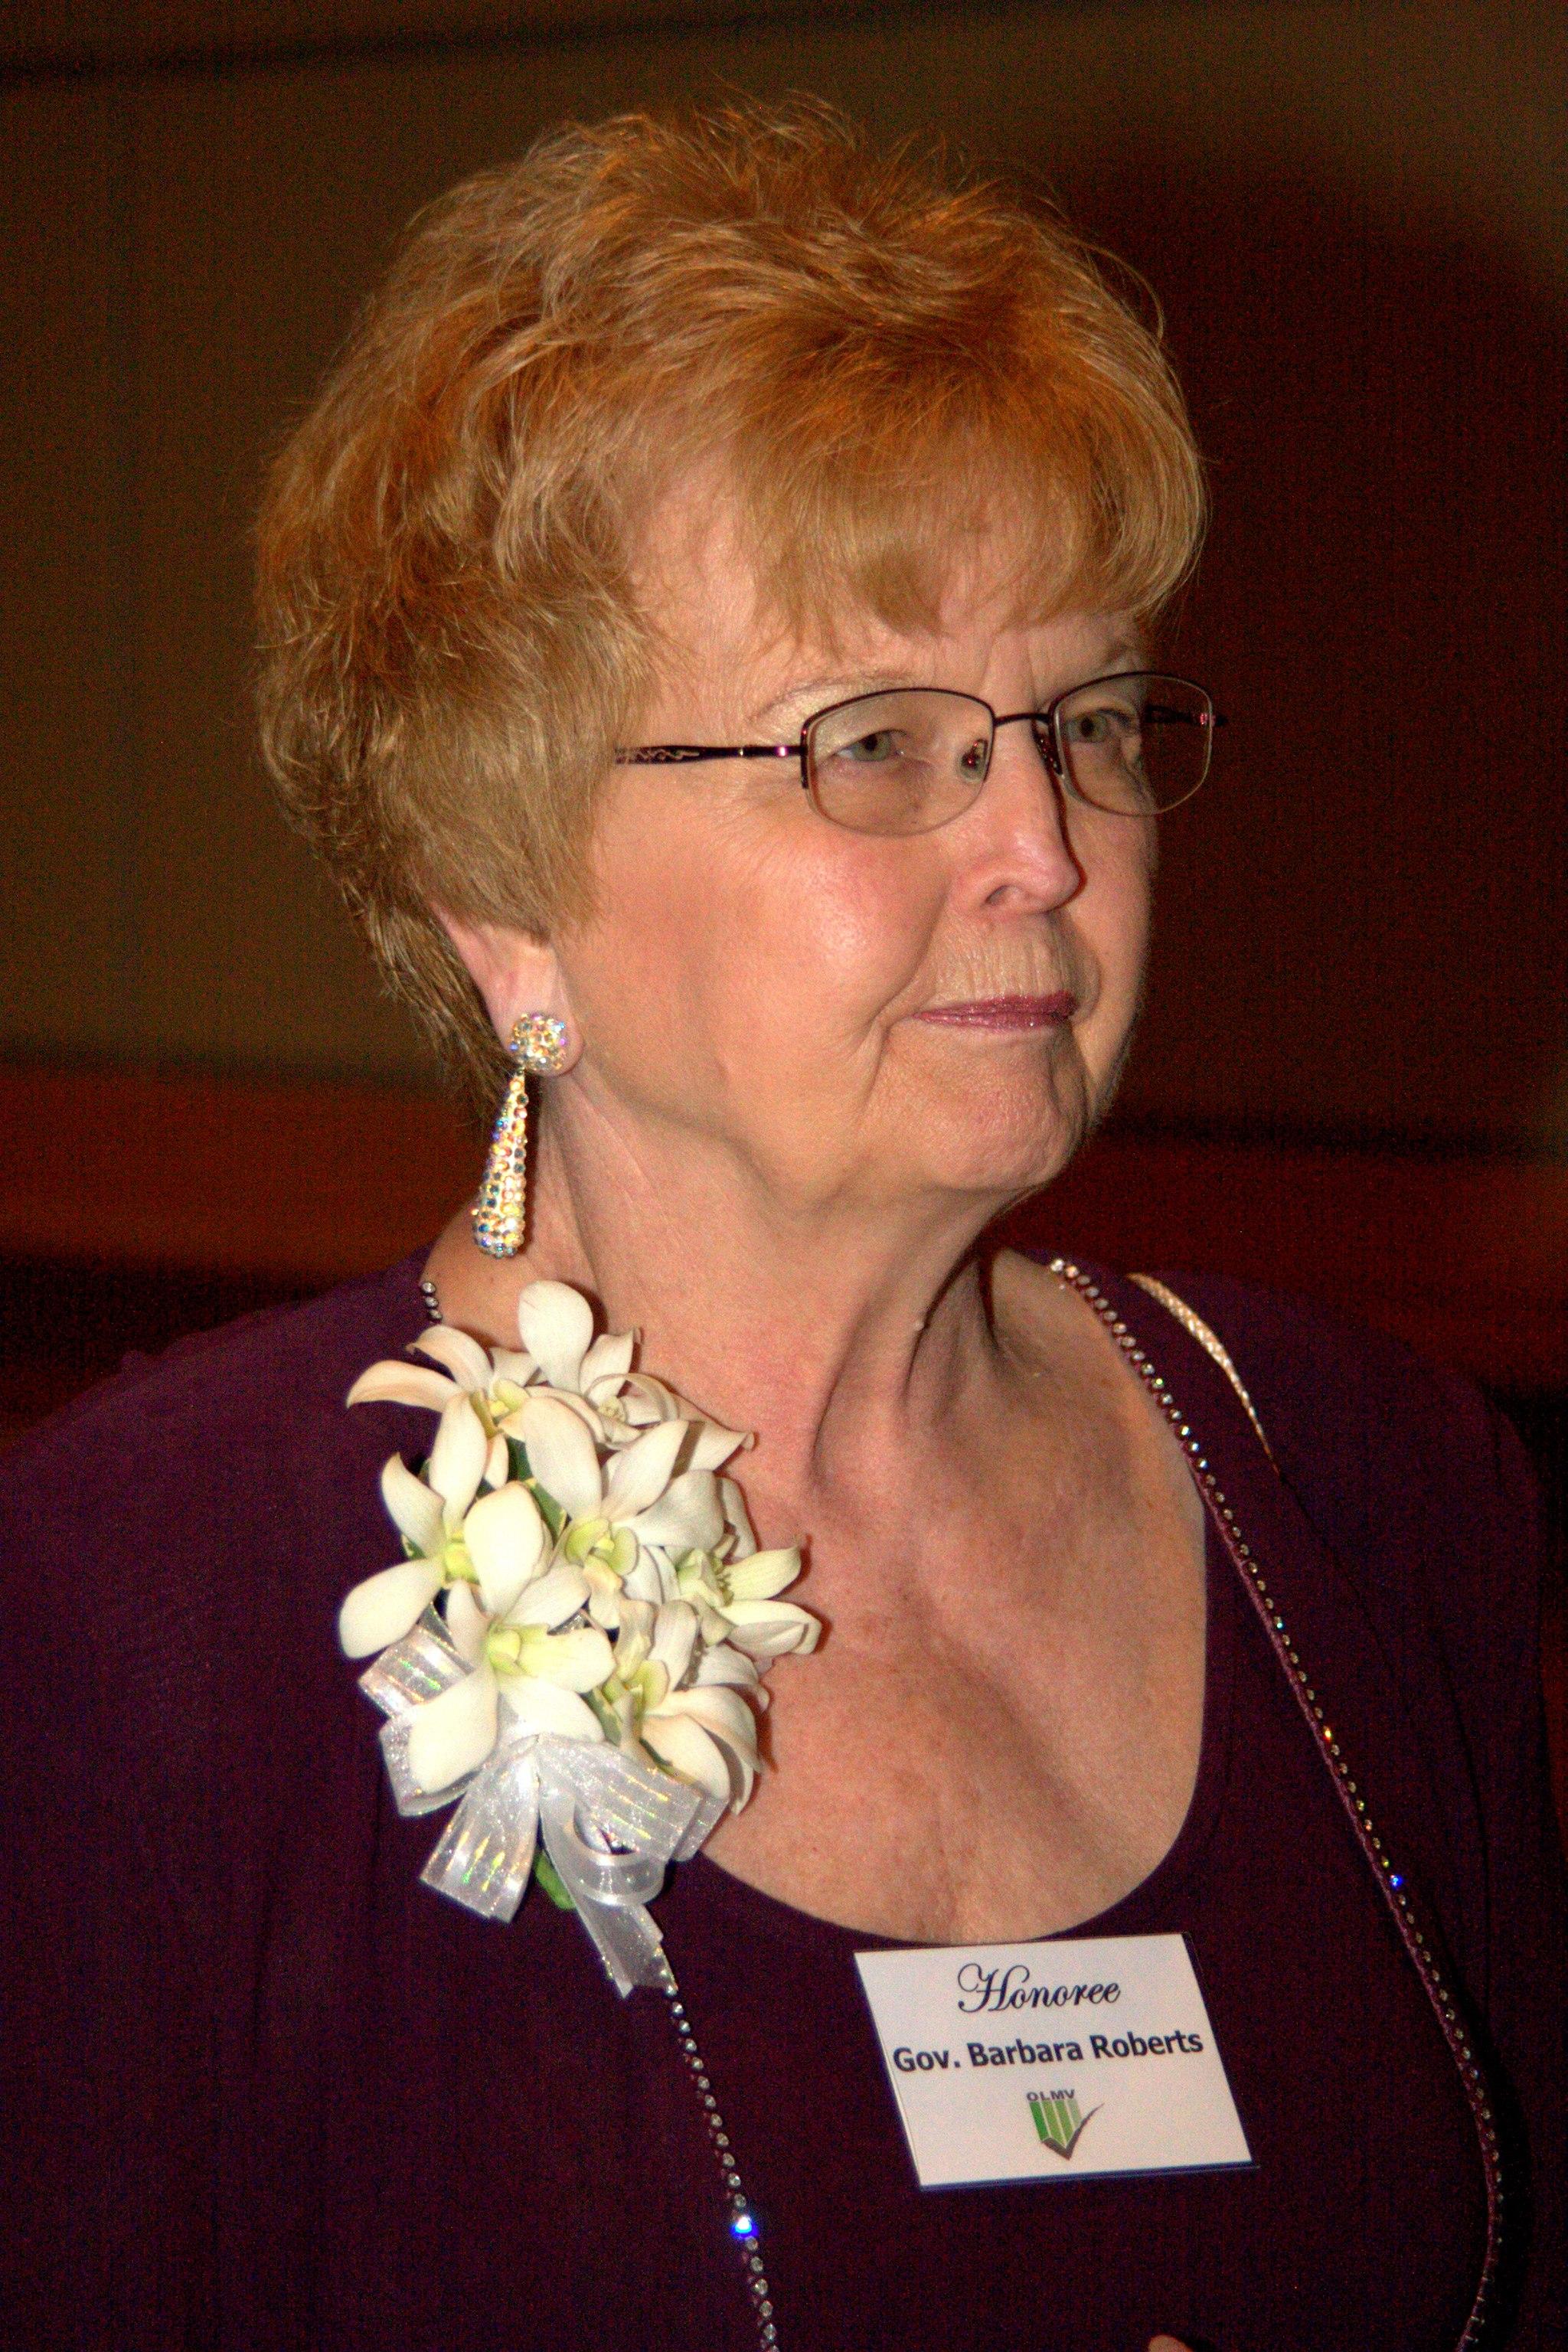 Oregon Governor Barbara Roberts in 2009.  Source: Wikipedia